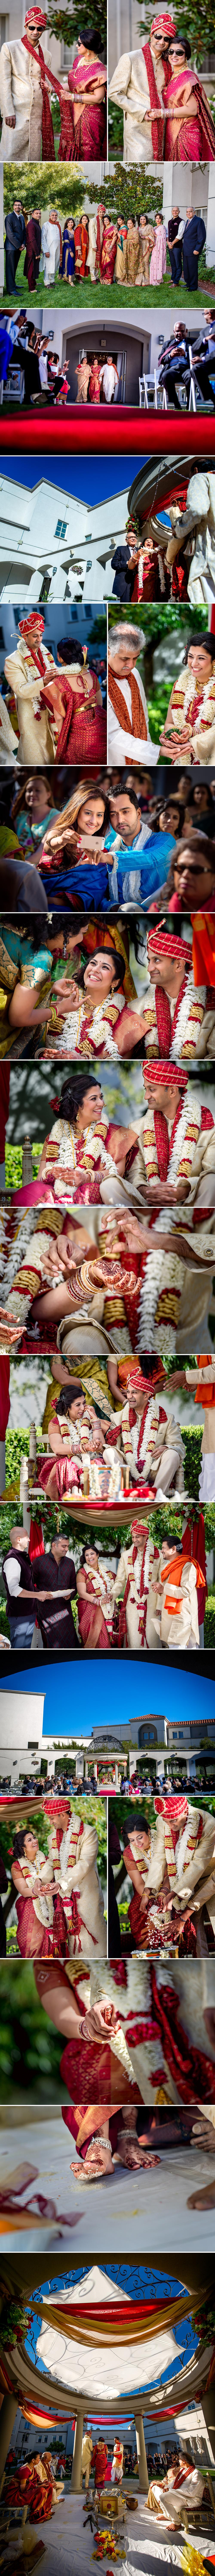 Indian wedding San Mateo Mariott